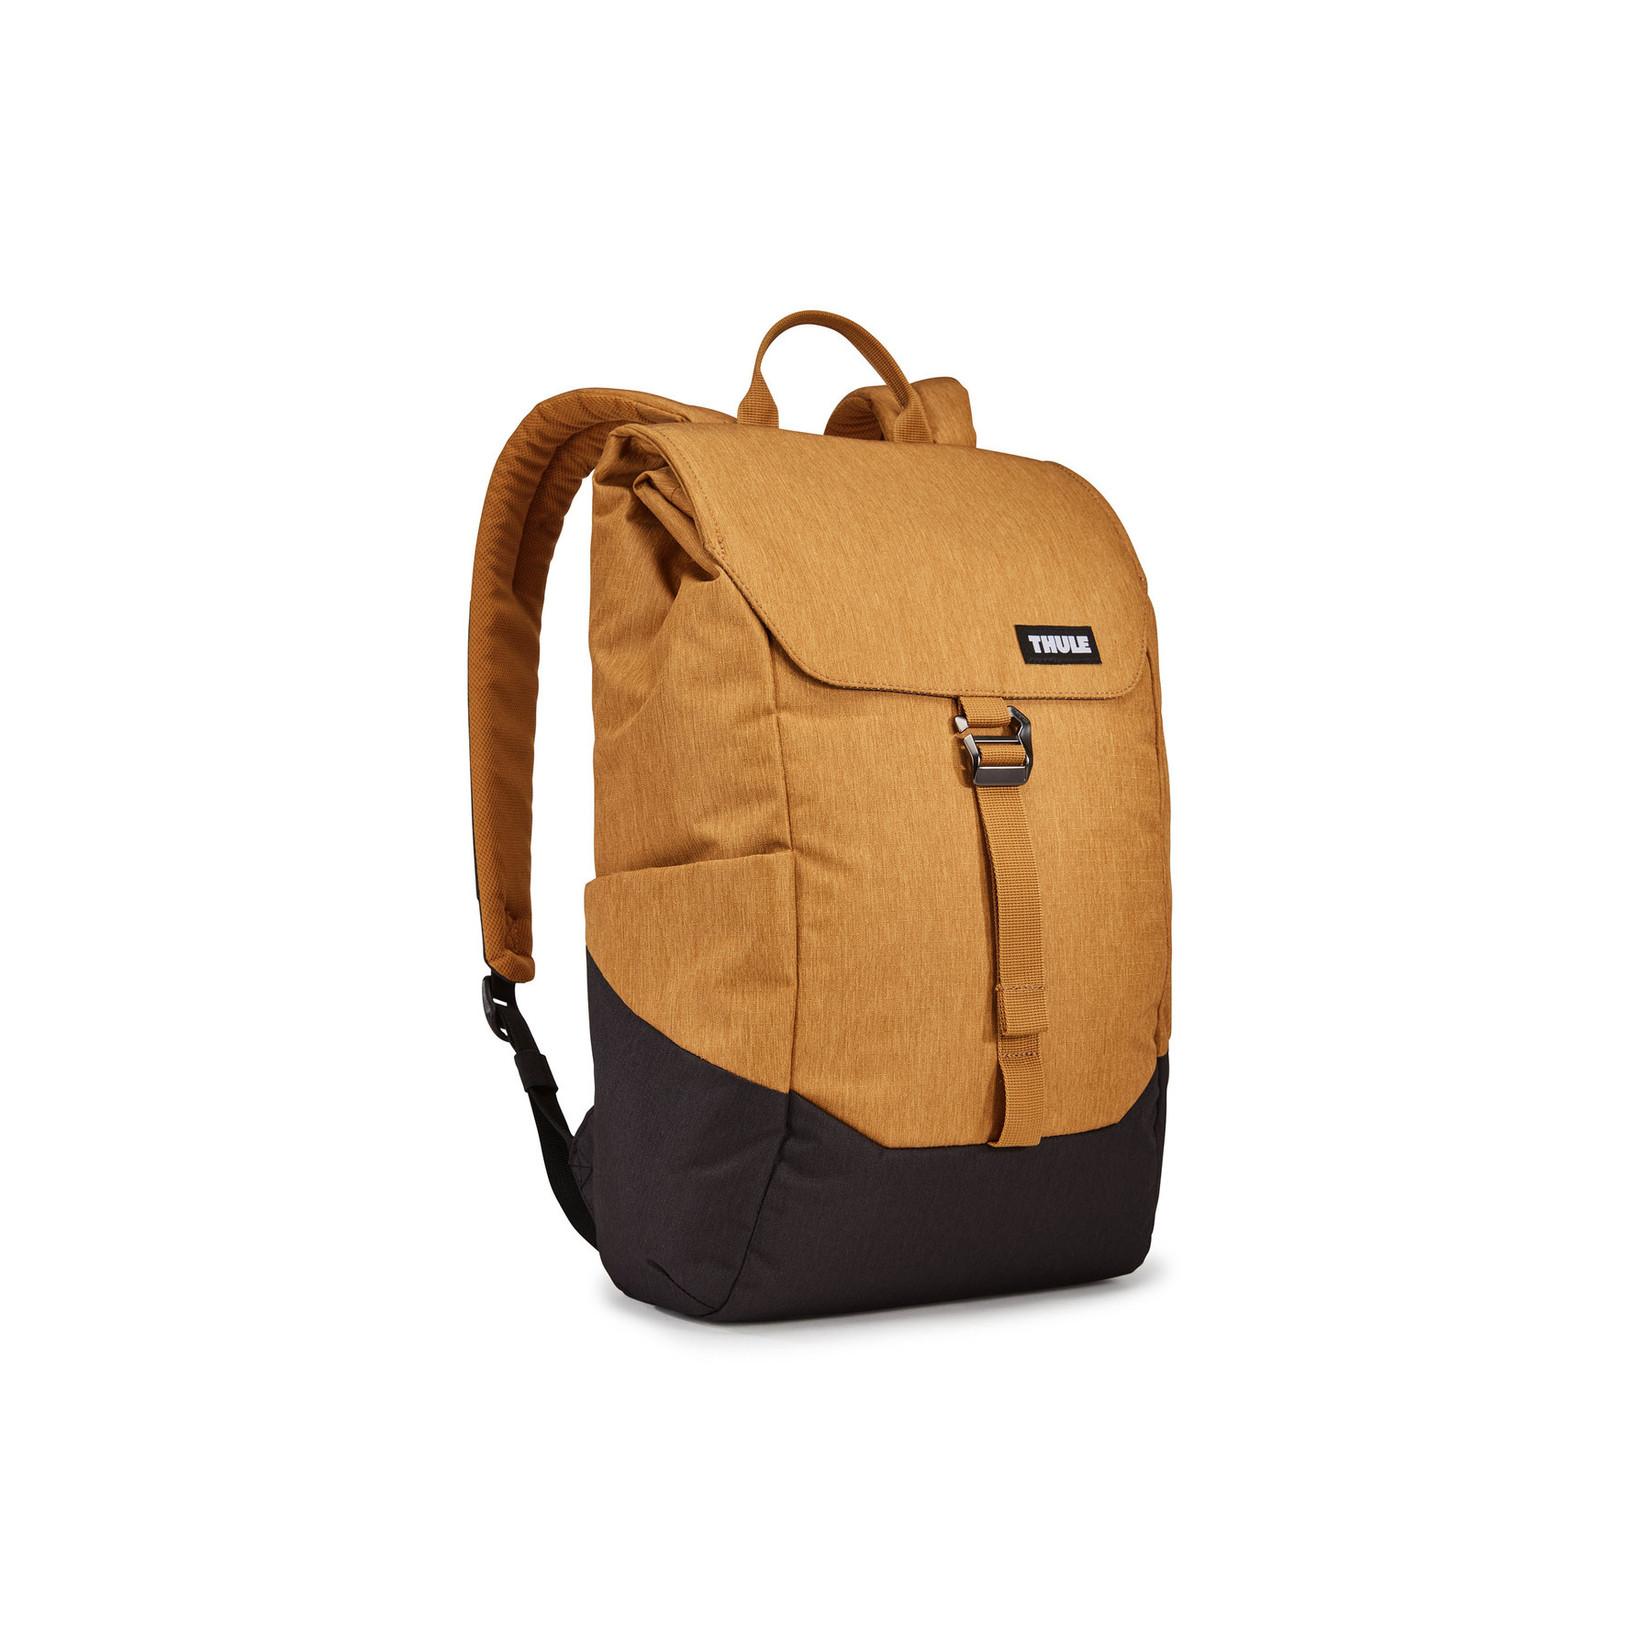 Thule Thule Lithos Backpack 16L